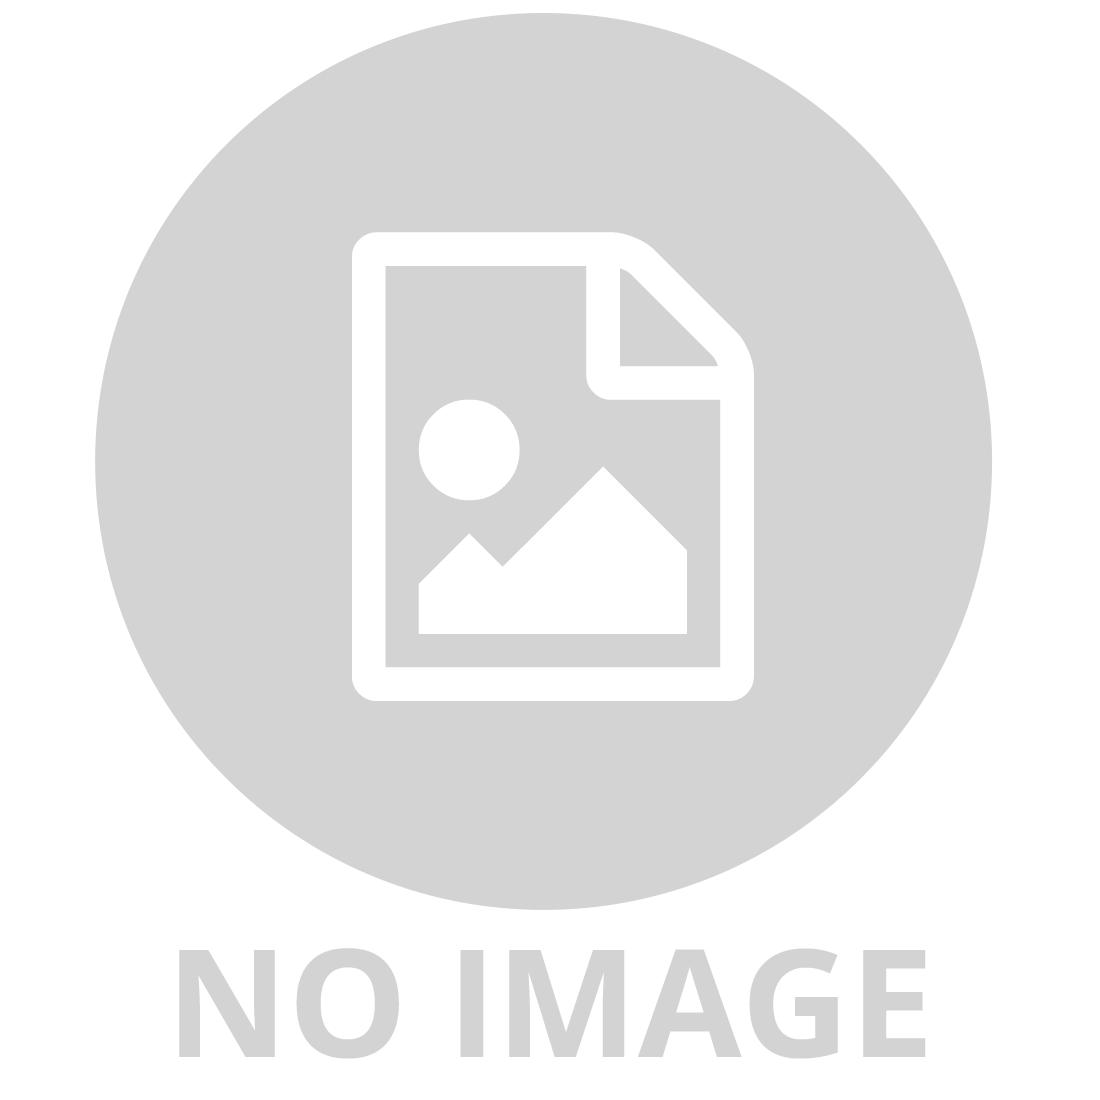 DOLLS WORLD BABY CARRIER